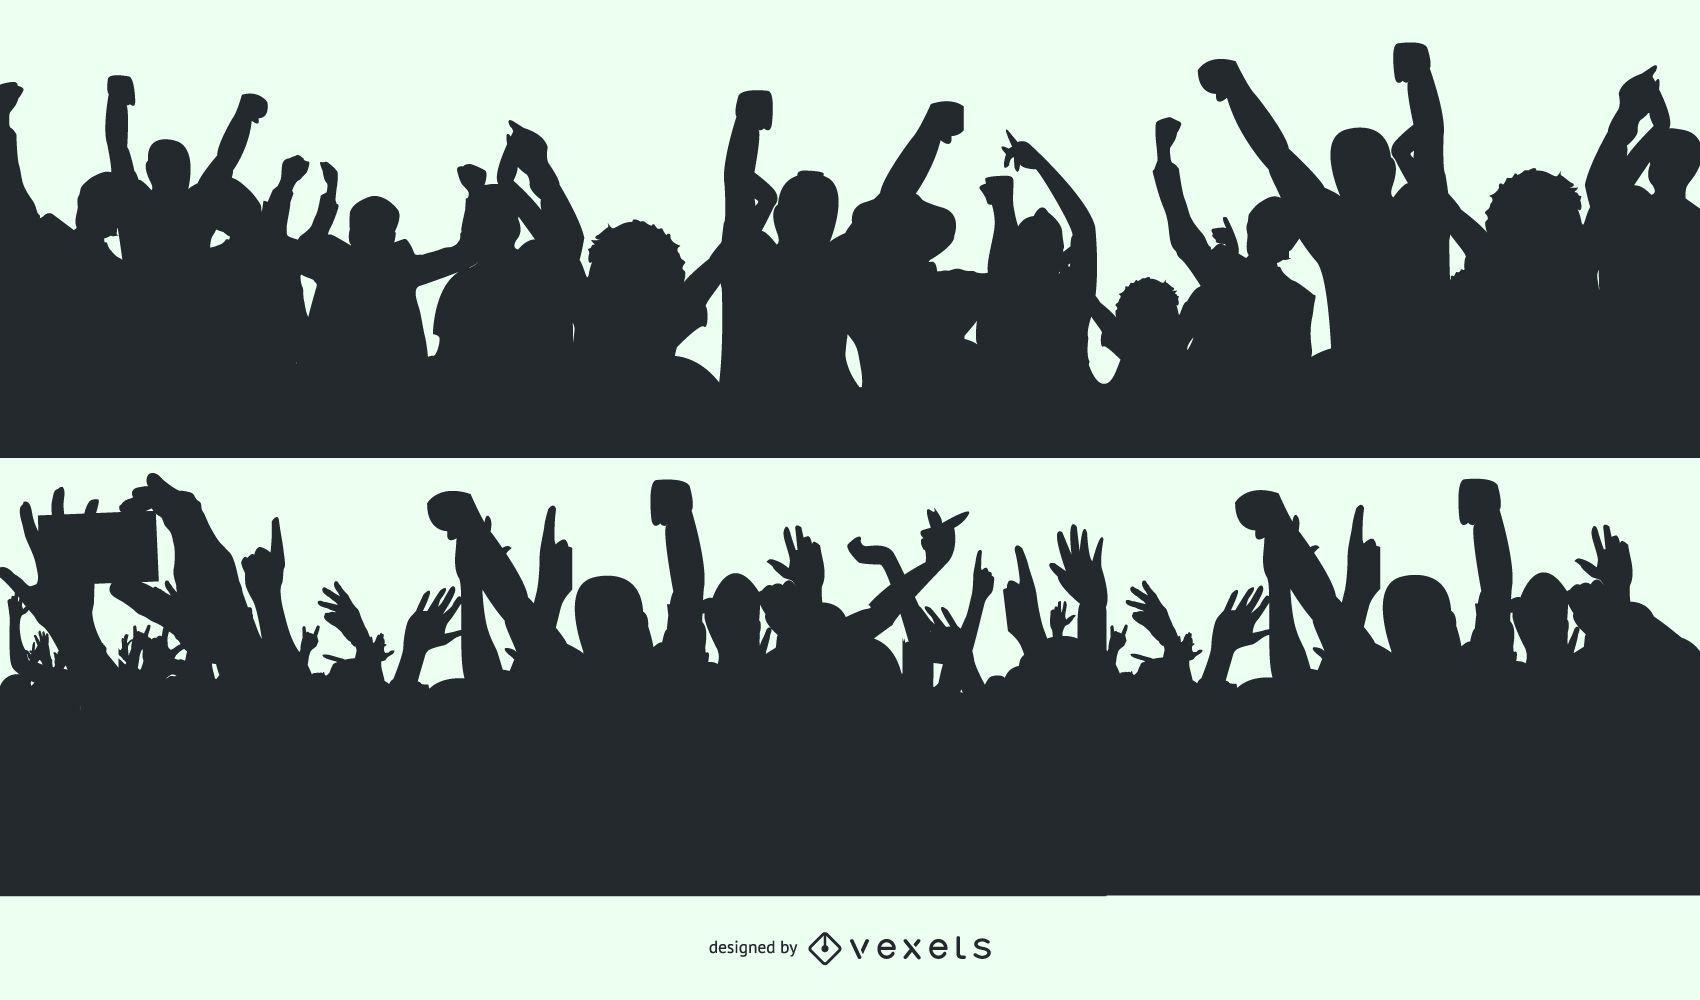 Cheering Crowd Silhouette Designs